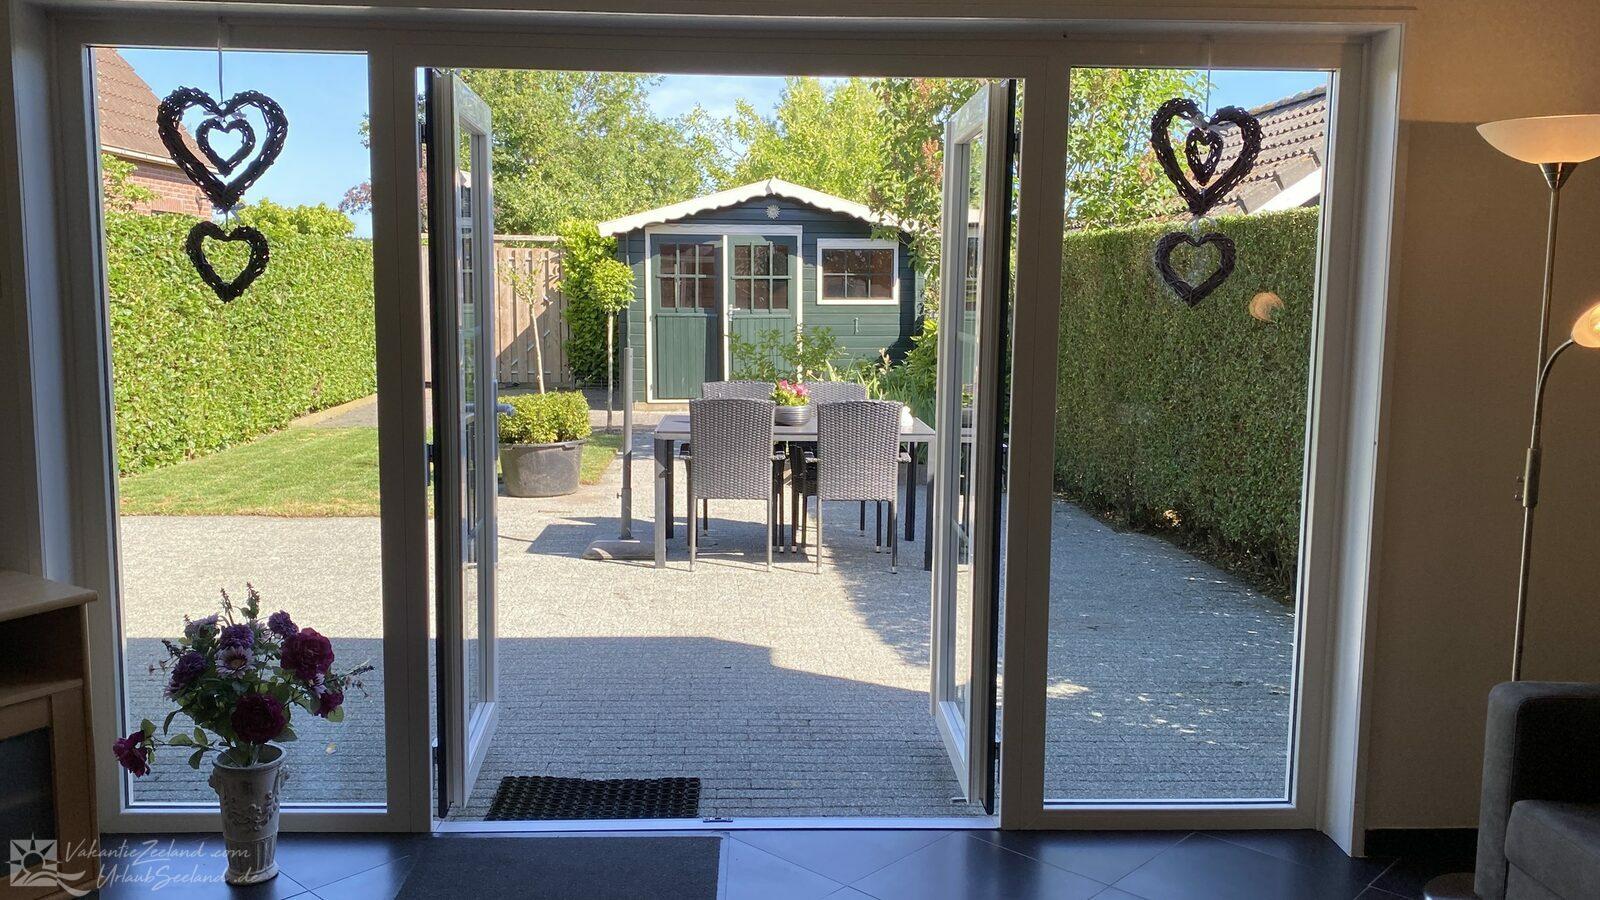 VZ207 Ferienhaus in Oud-Sabbinge